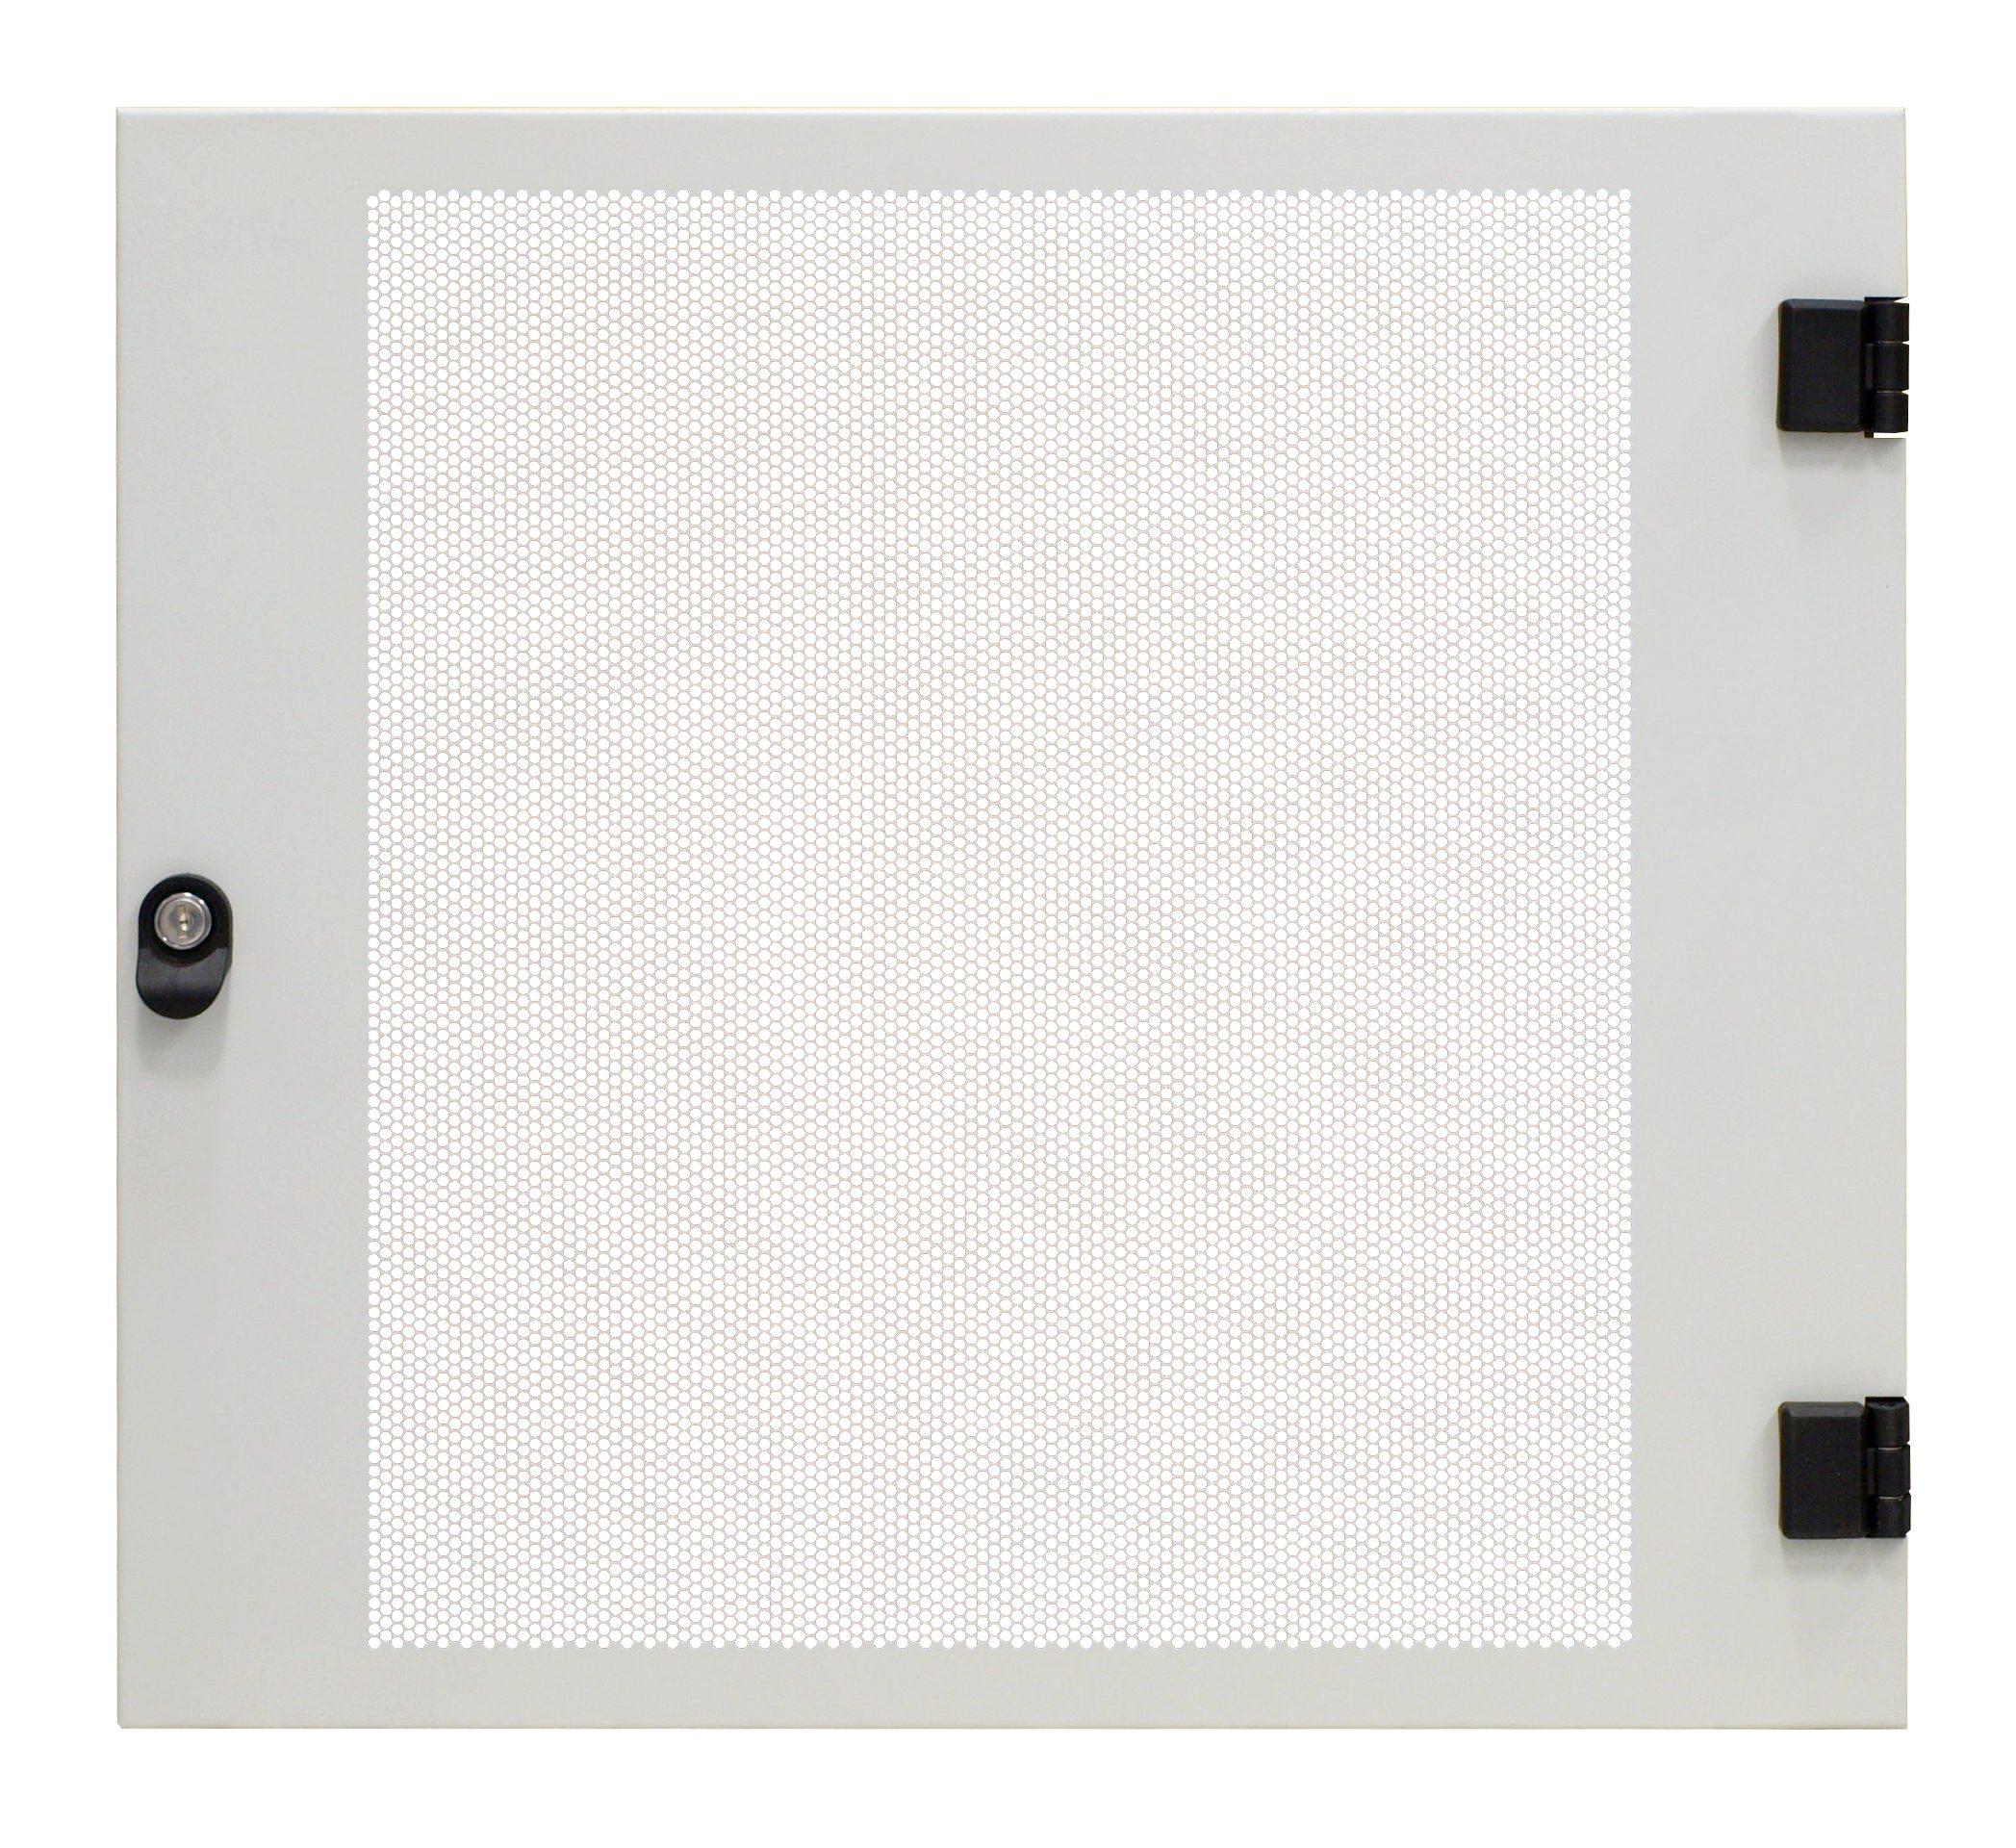 1 Stk Metall-Tür perforiert 80% f. DW-Schrank 12HE, B=600, RAL7035 DWRT1261--